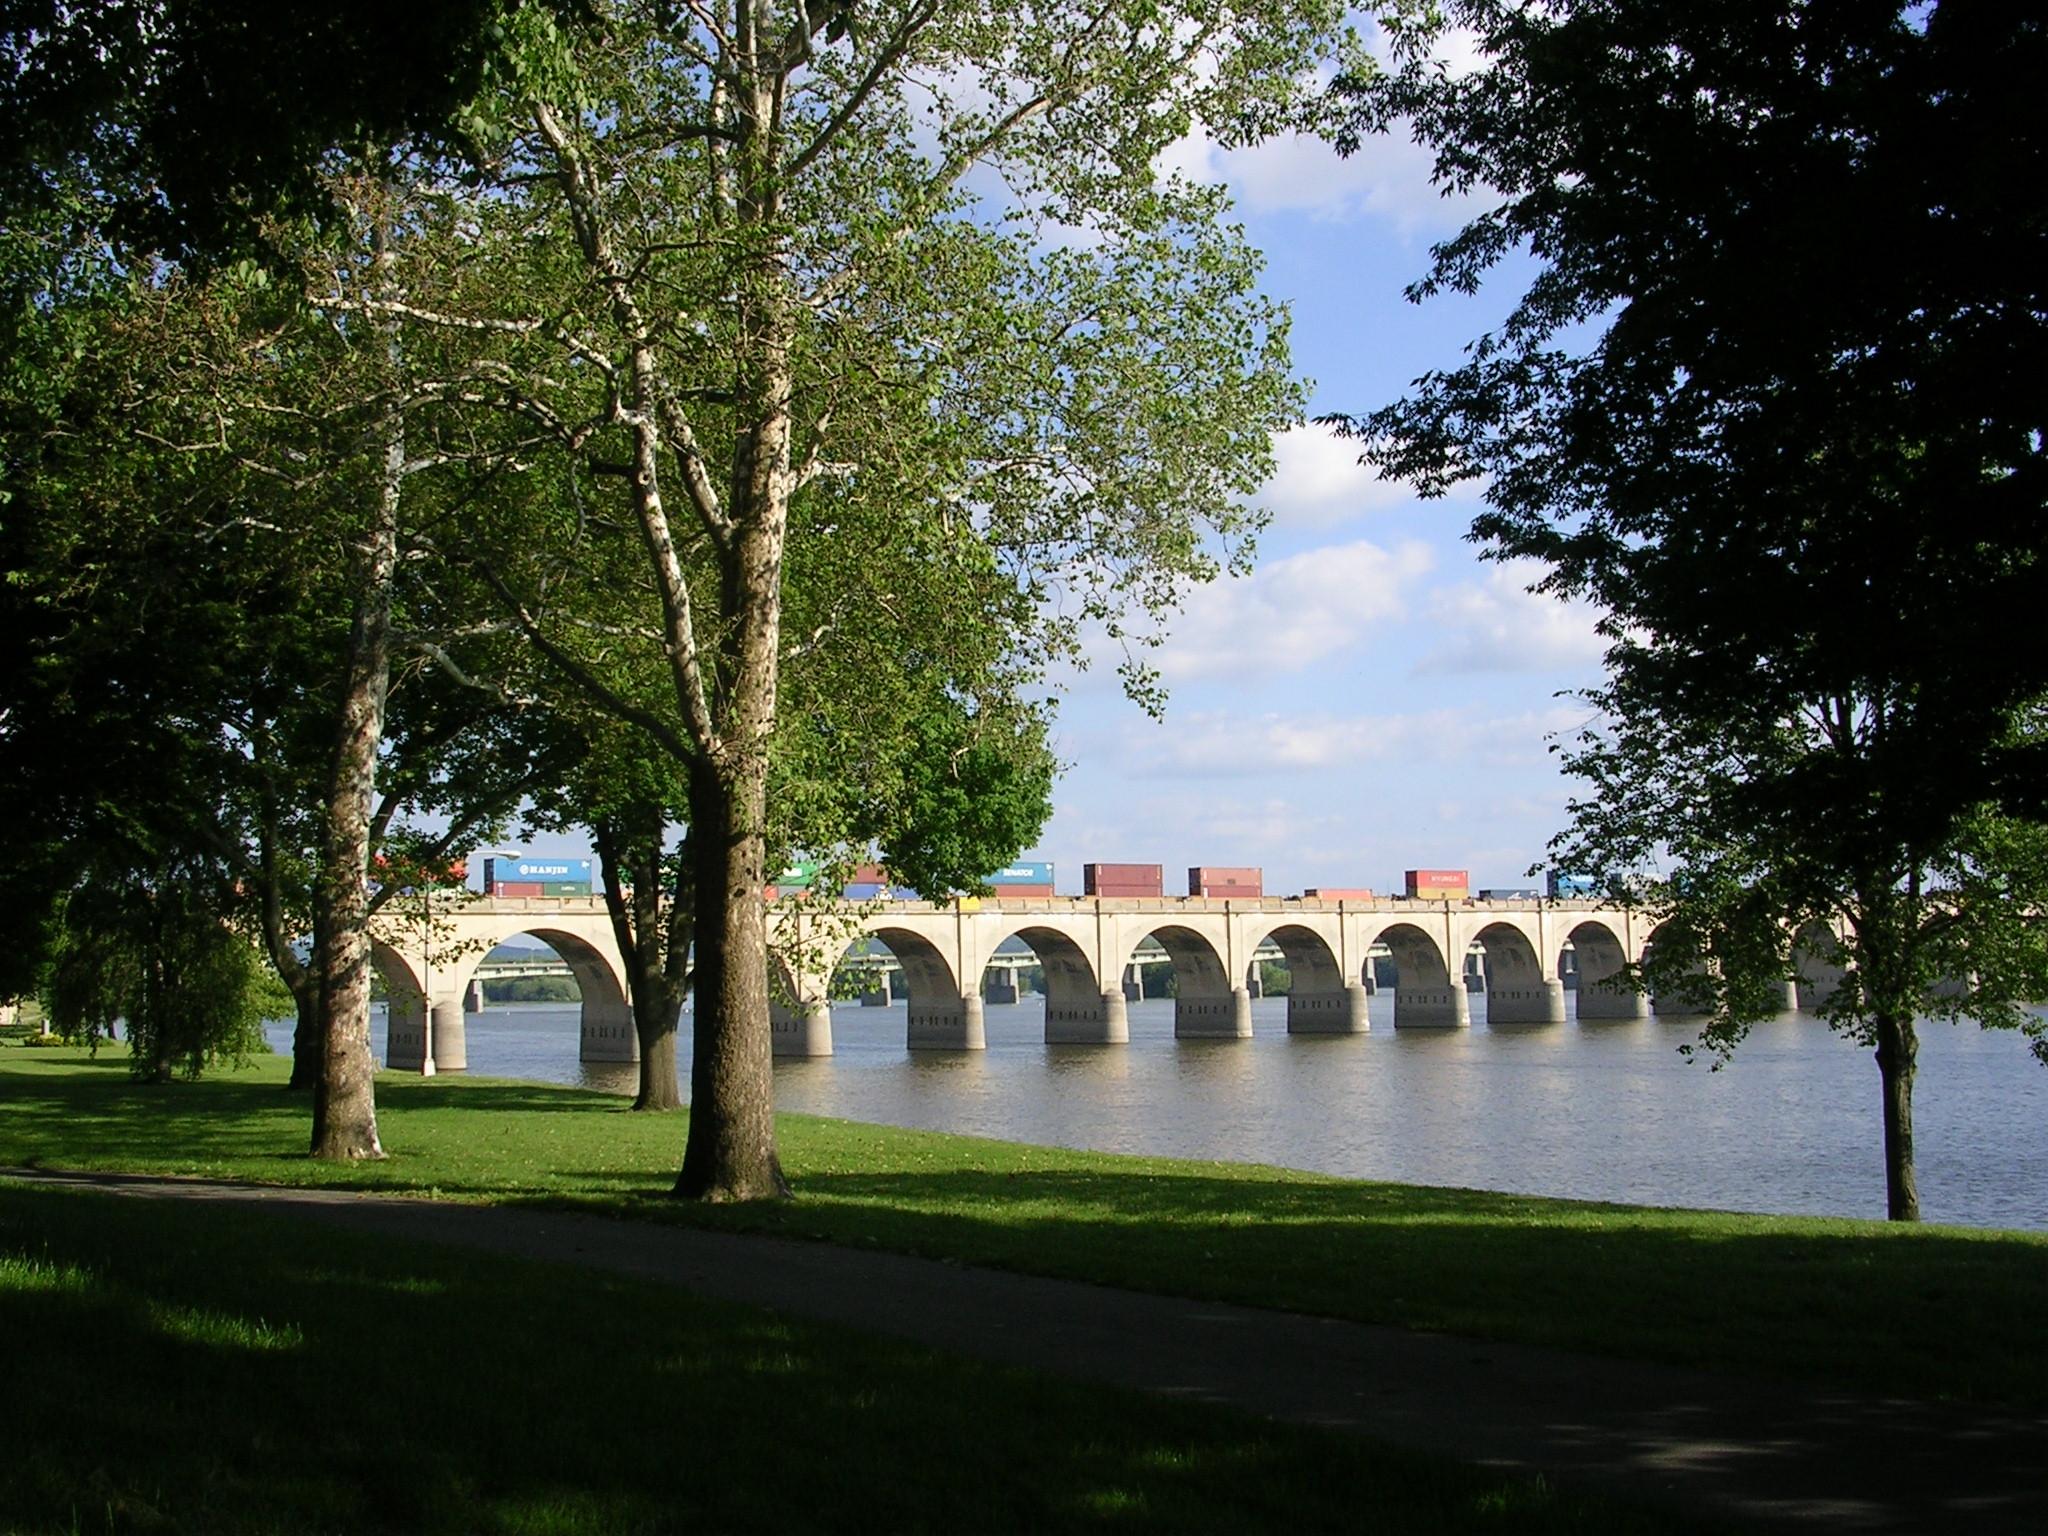 Philadelphia & Reading Railroad Bridge (Harrisburg